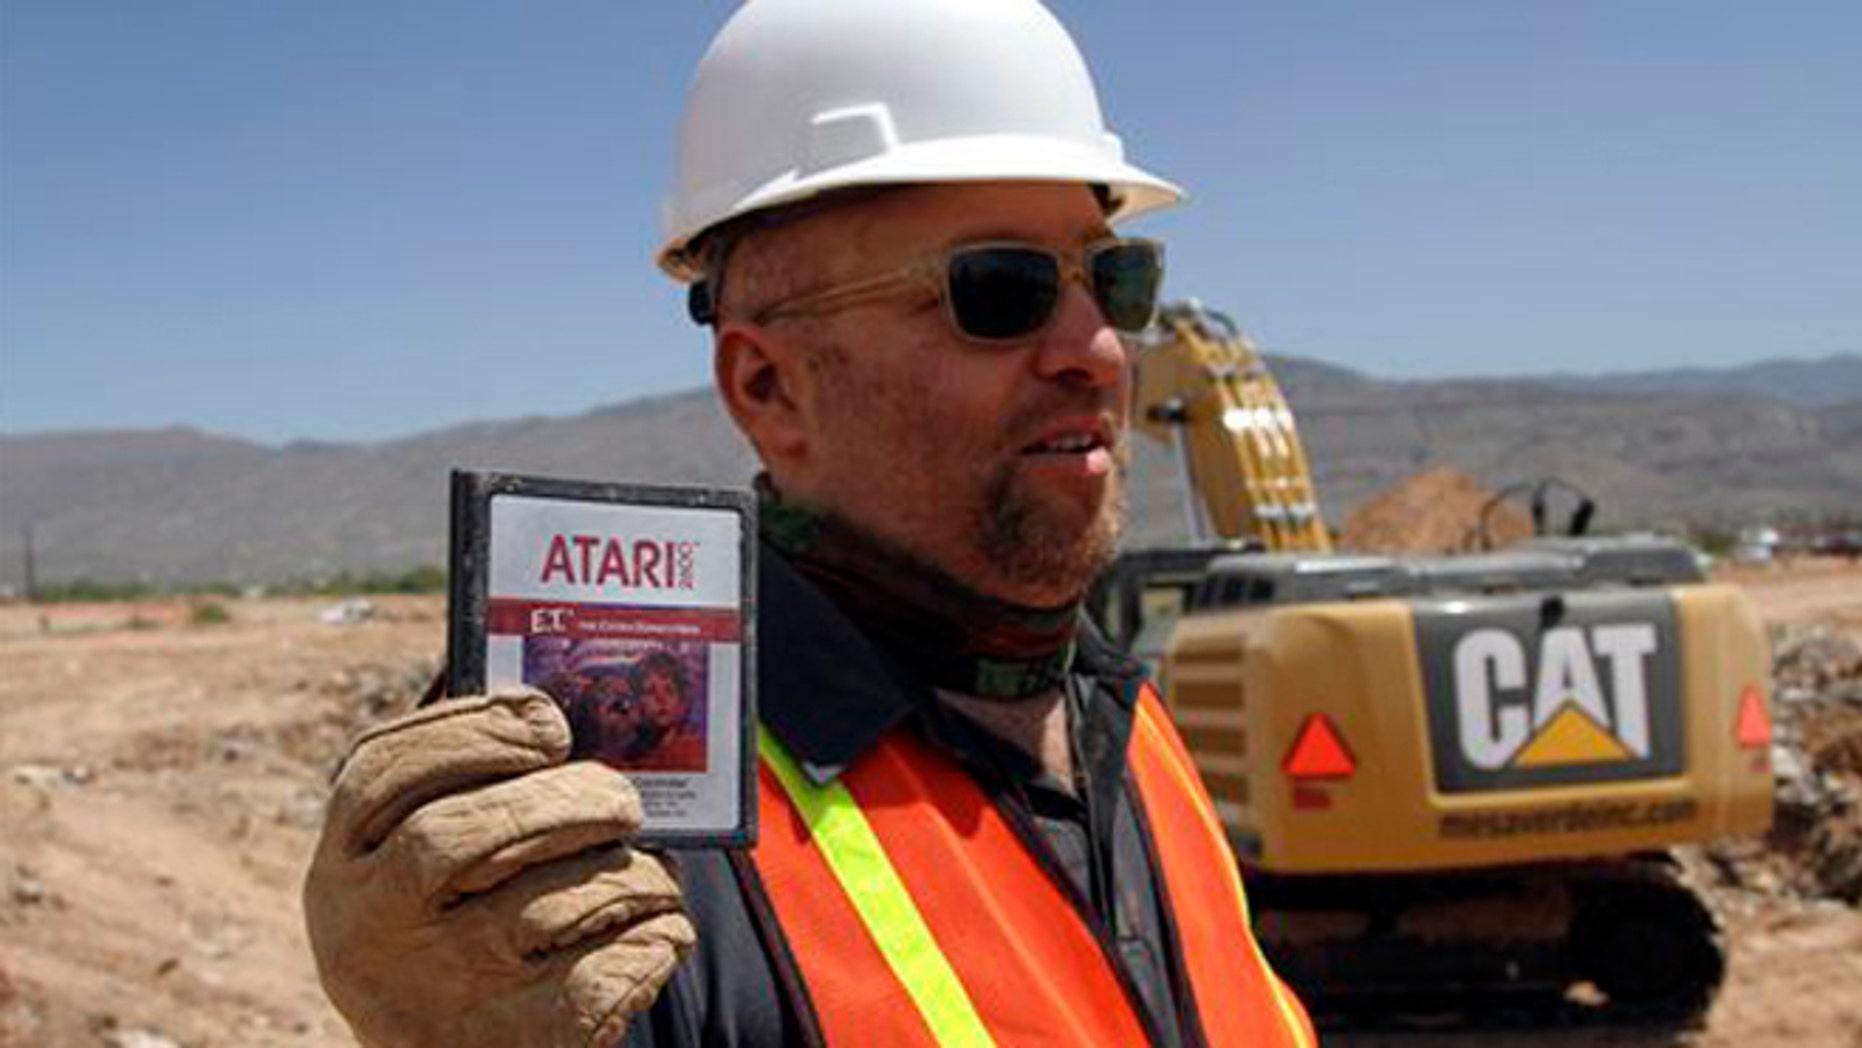 "April 26, 2014: In this file photo, film director Zak Penn shows a box of a decades-old Atari ""E.T. the Extra-Terrestrial"" game found in a dumpsite in Alamogordo, N.M."